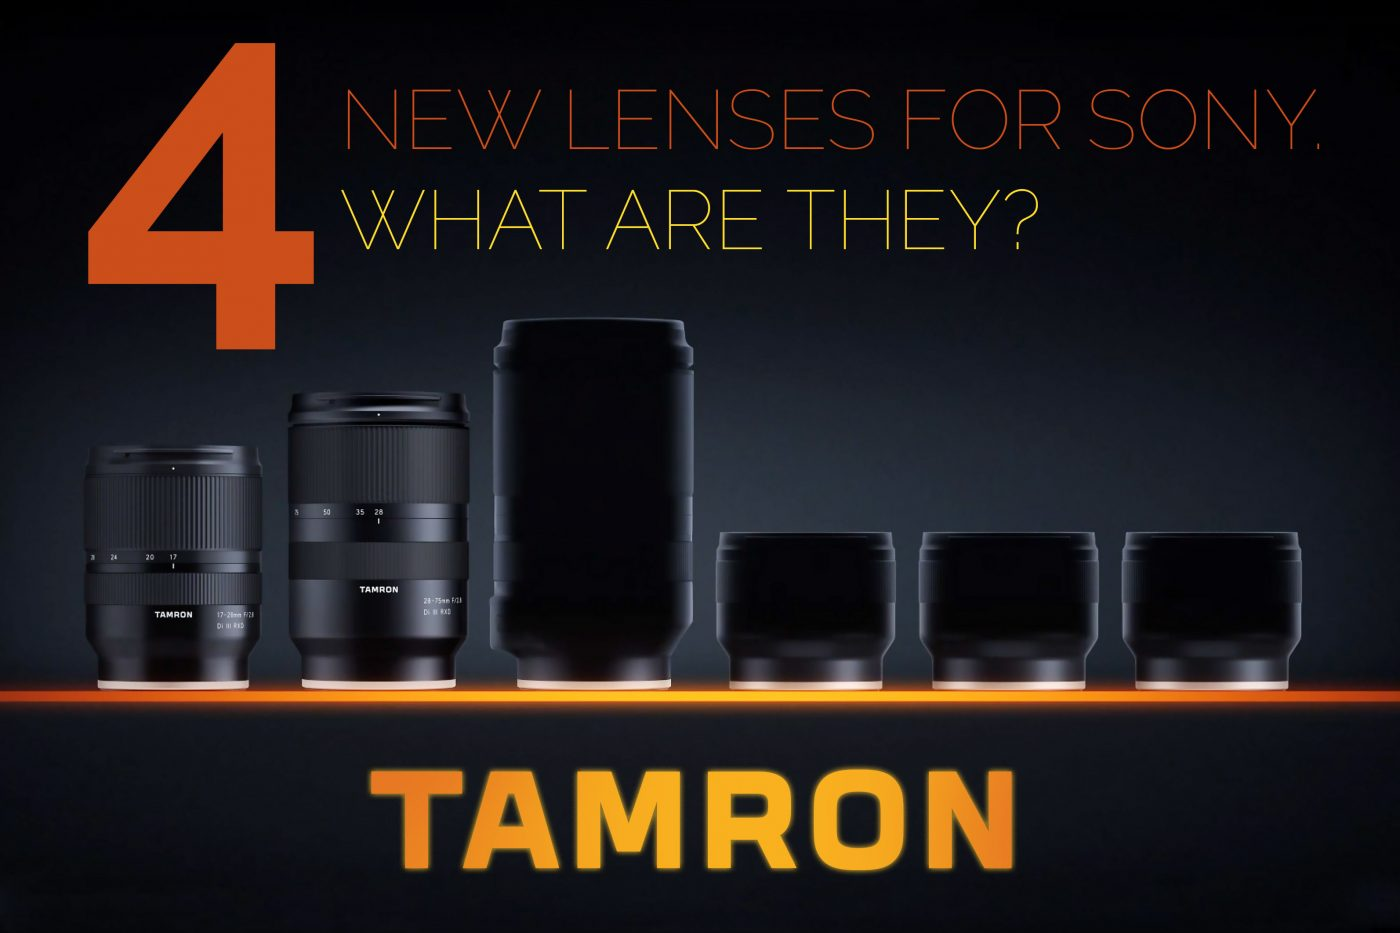 Teaser Images of Tamron Lenses